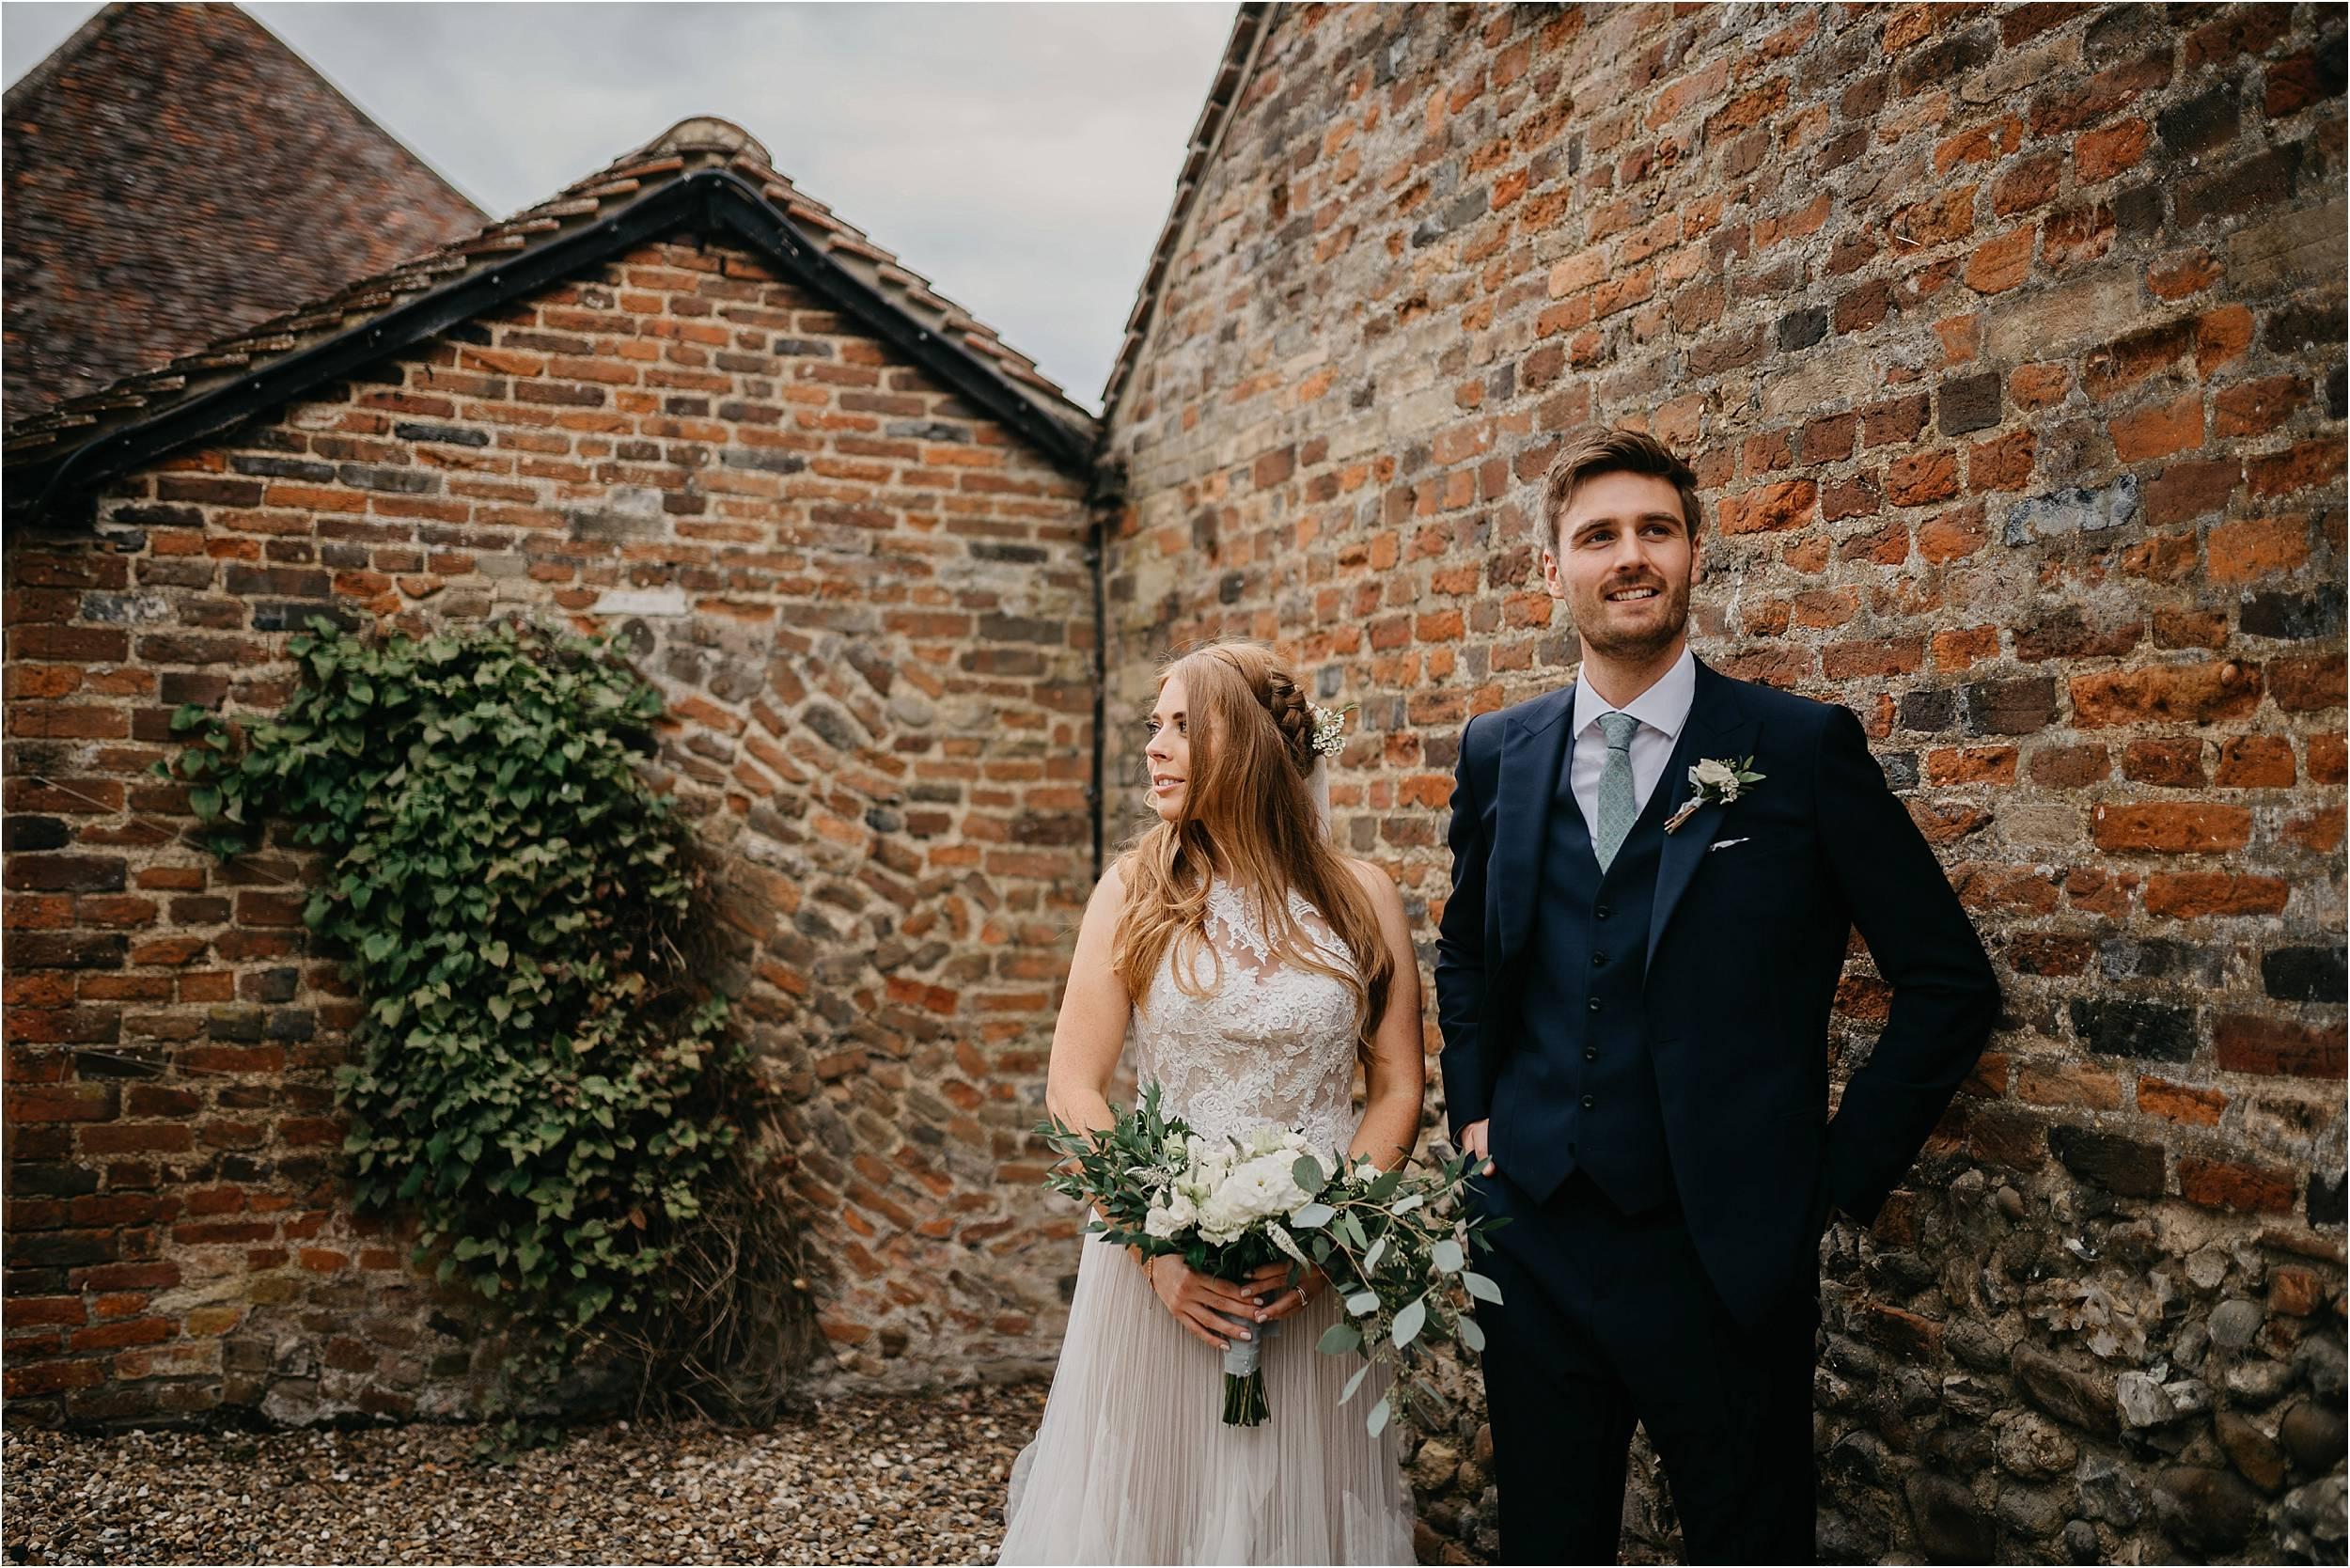 The Priory Little Wymondley Wedding Photography_0117.jpg